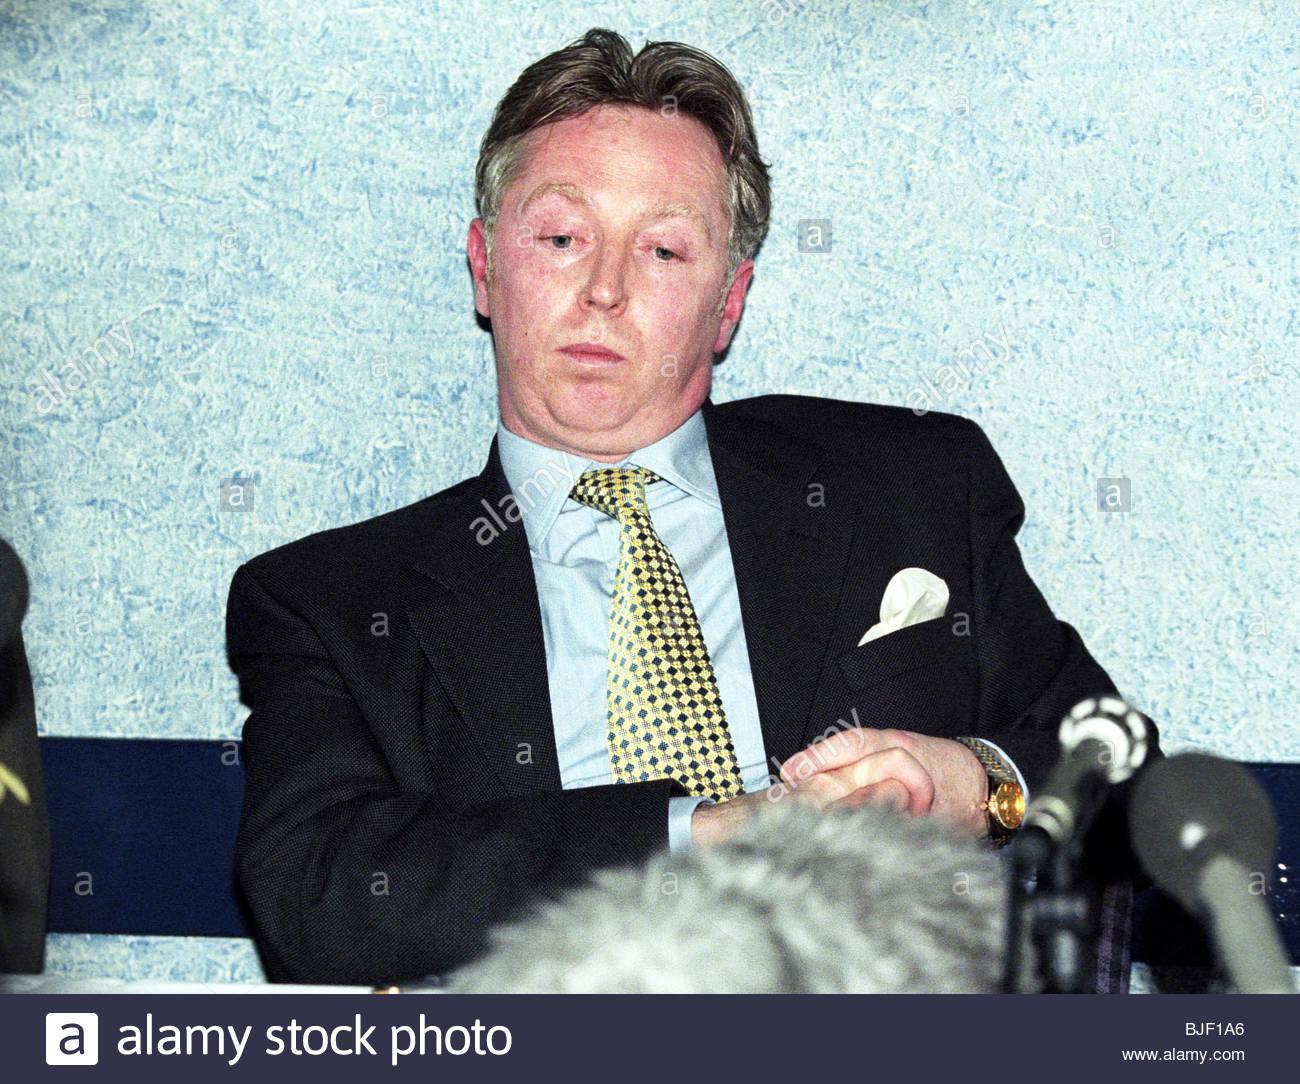 SEASON 1997/1998 Clydebank Financial consultant David Low - Stock Image